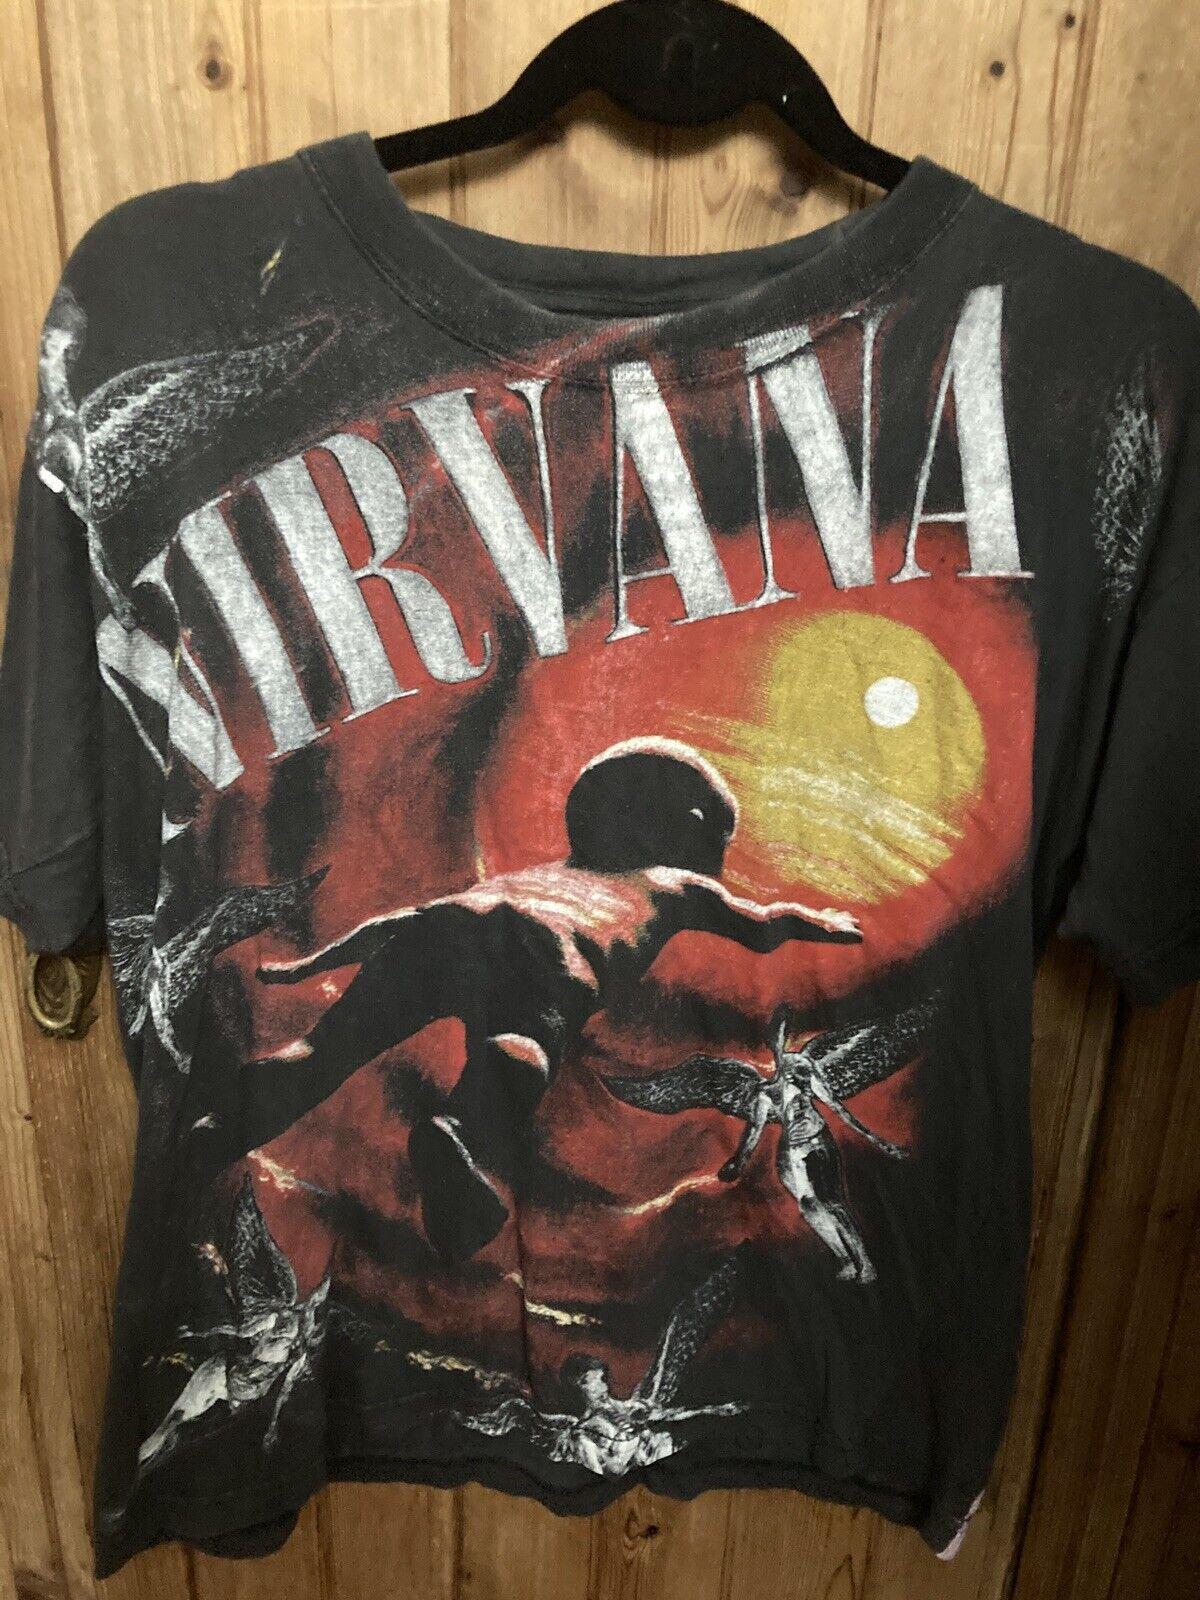 Vintage Nirvana very RARE t-shirt - image 2